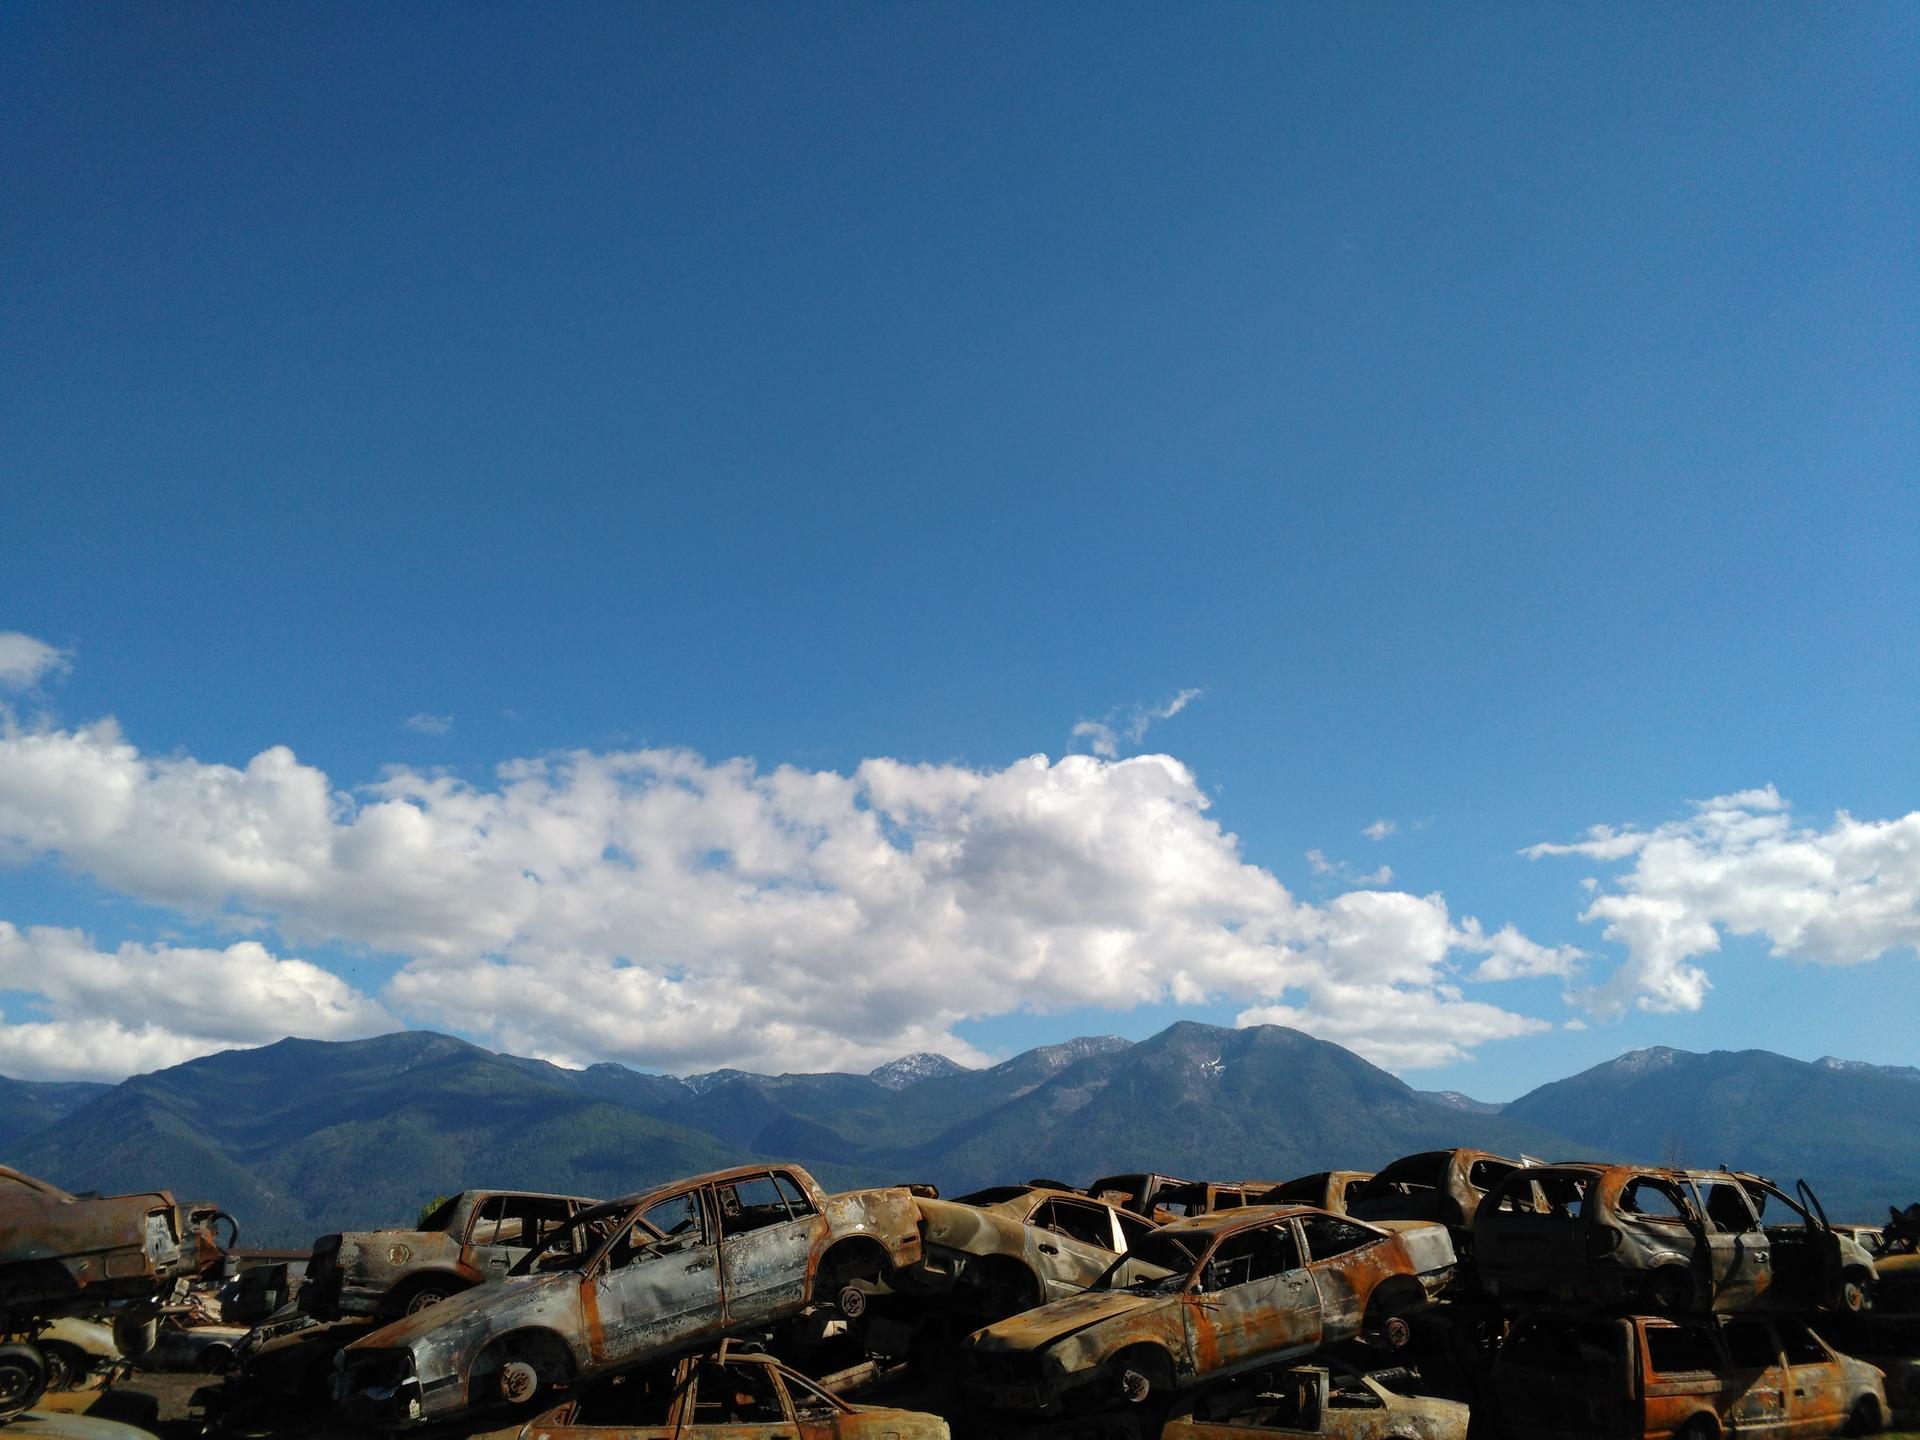 age in the wild | arthurj, blue sky, summer, architecture